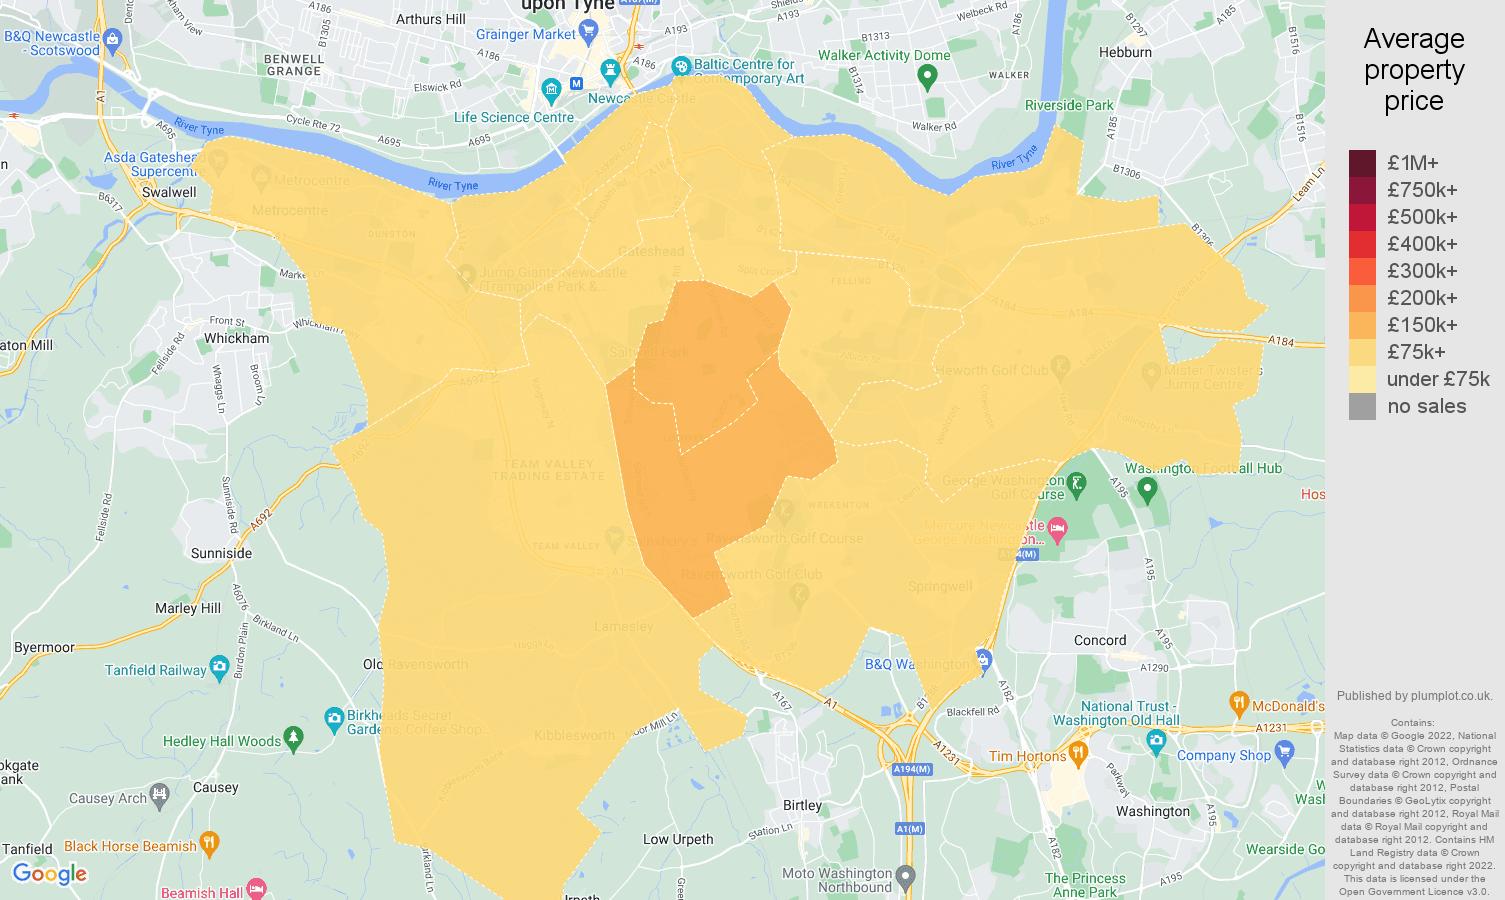 Gateshead house prices map